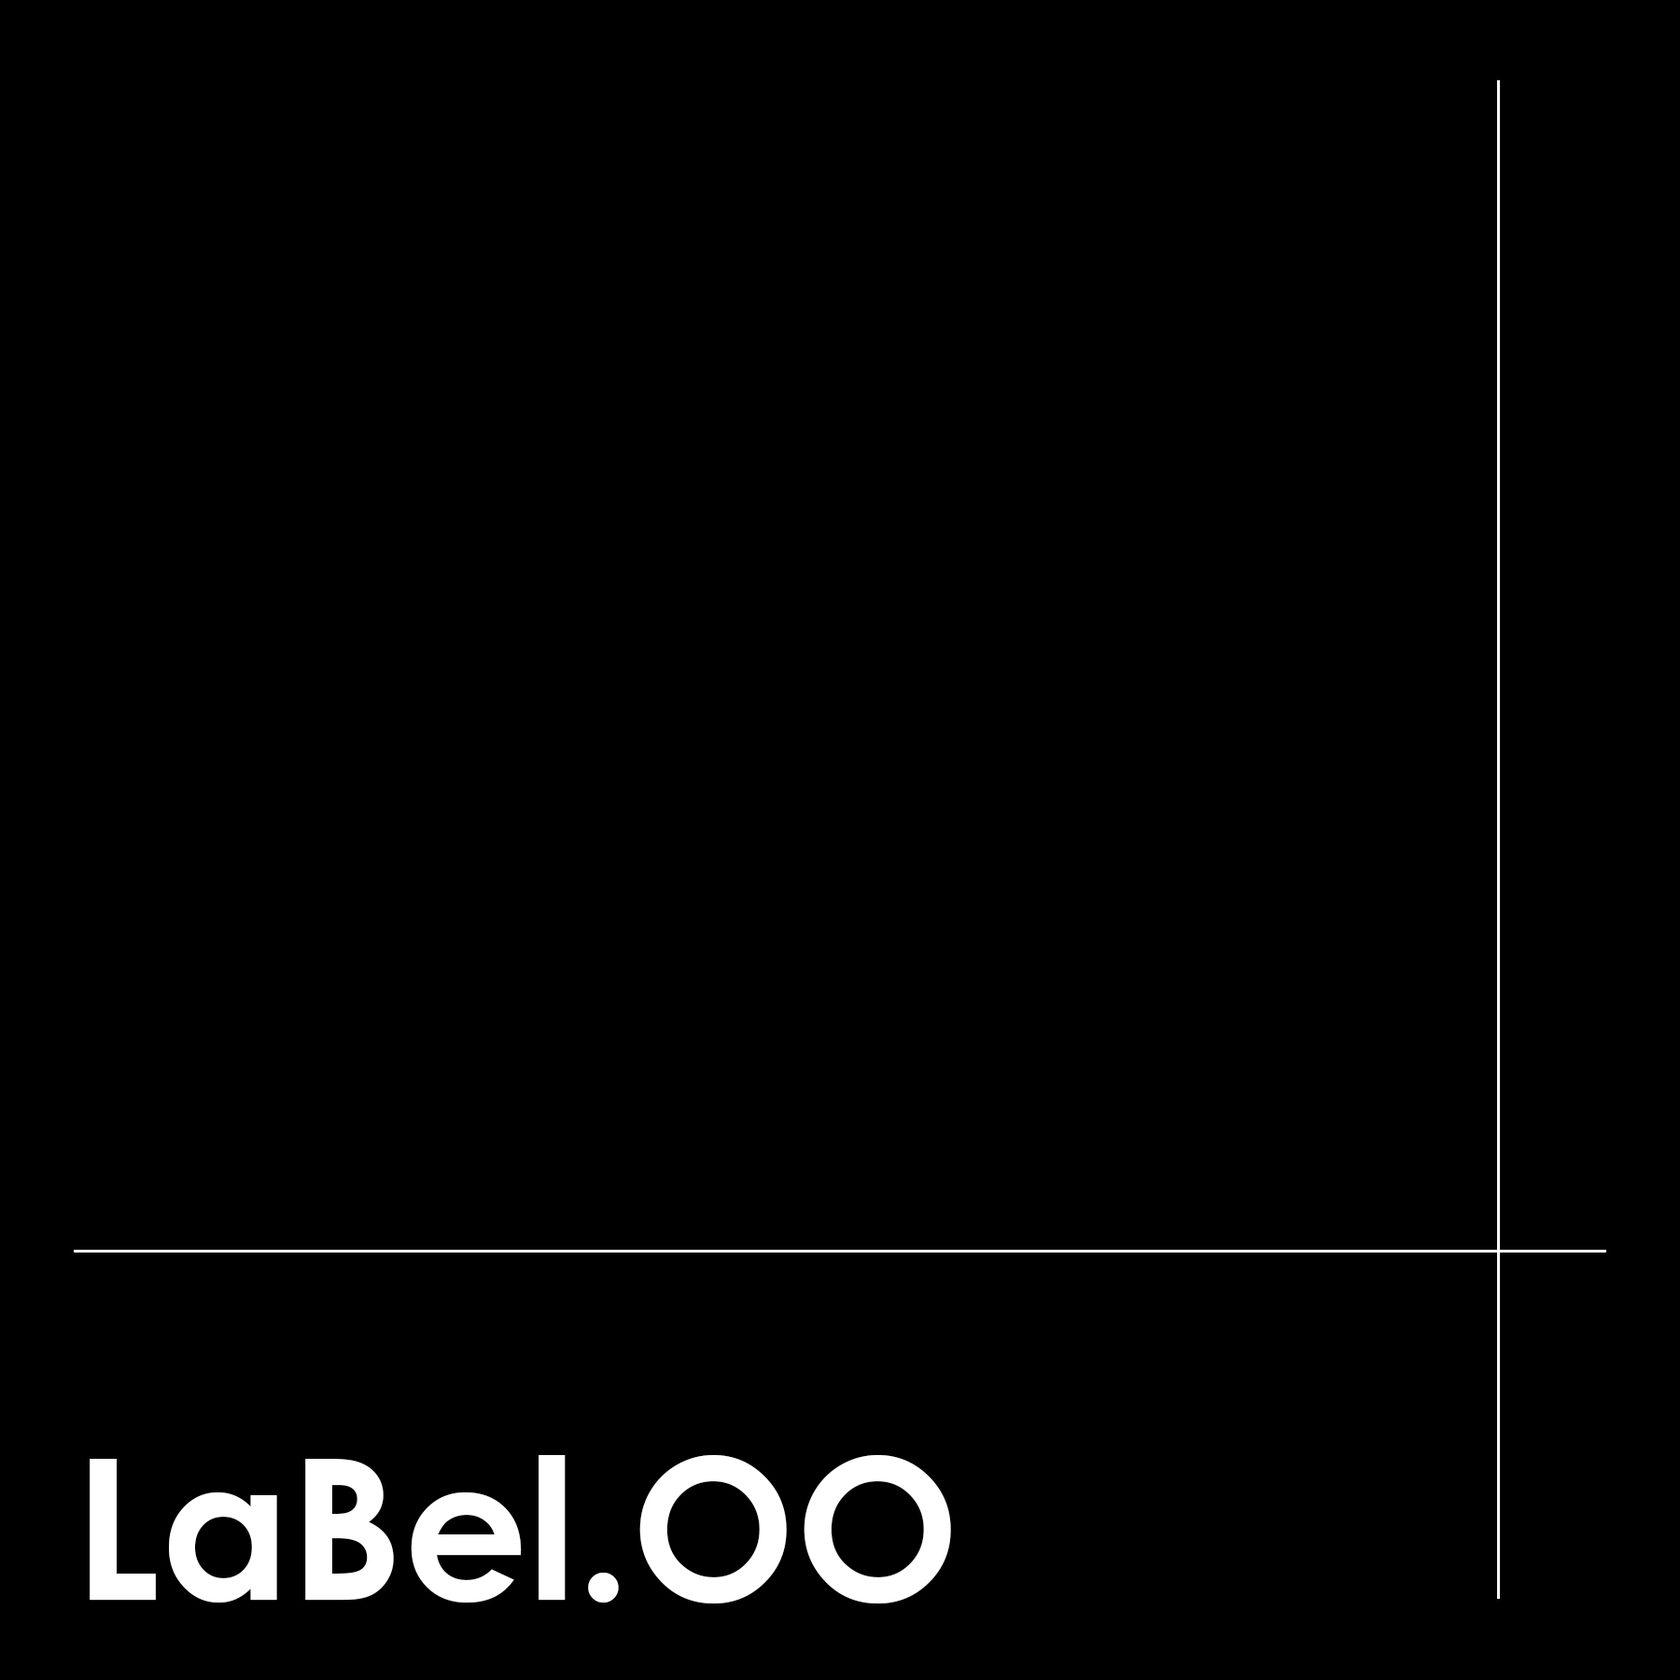 LaBel.OO